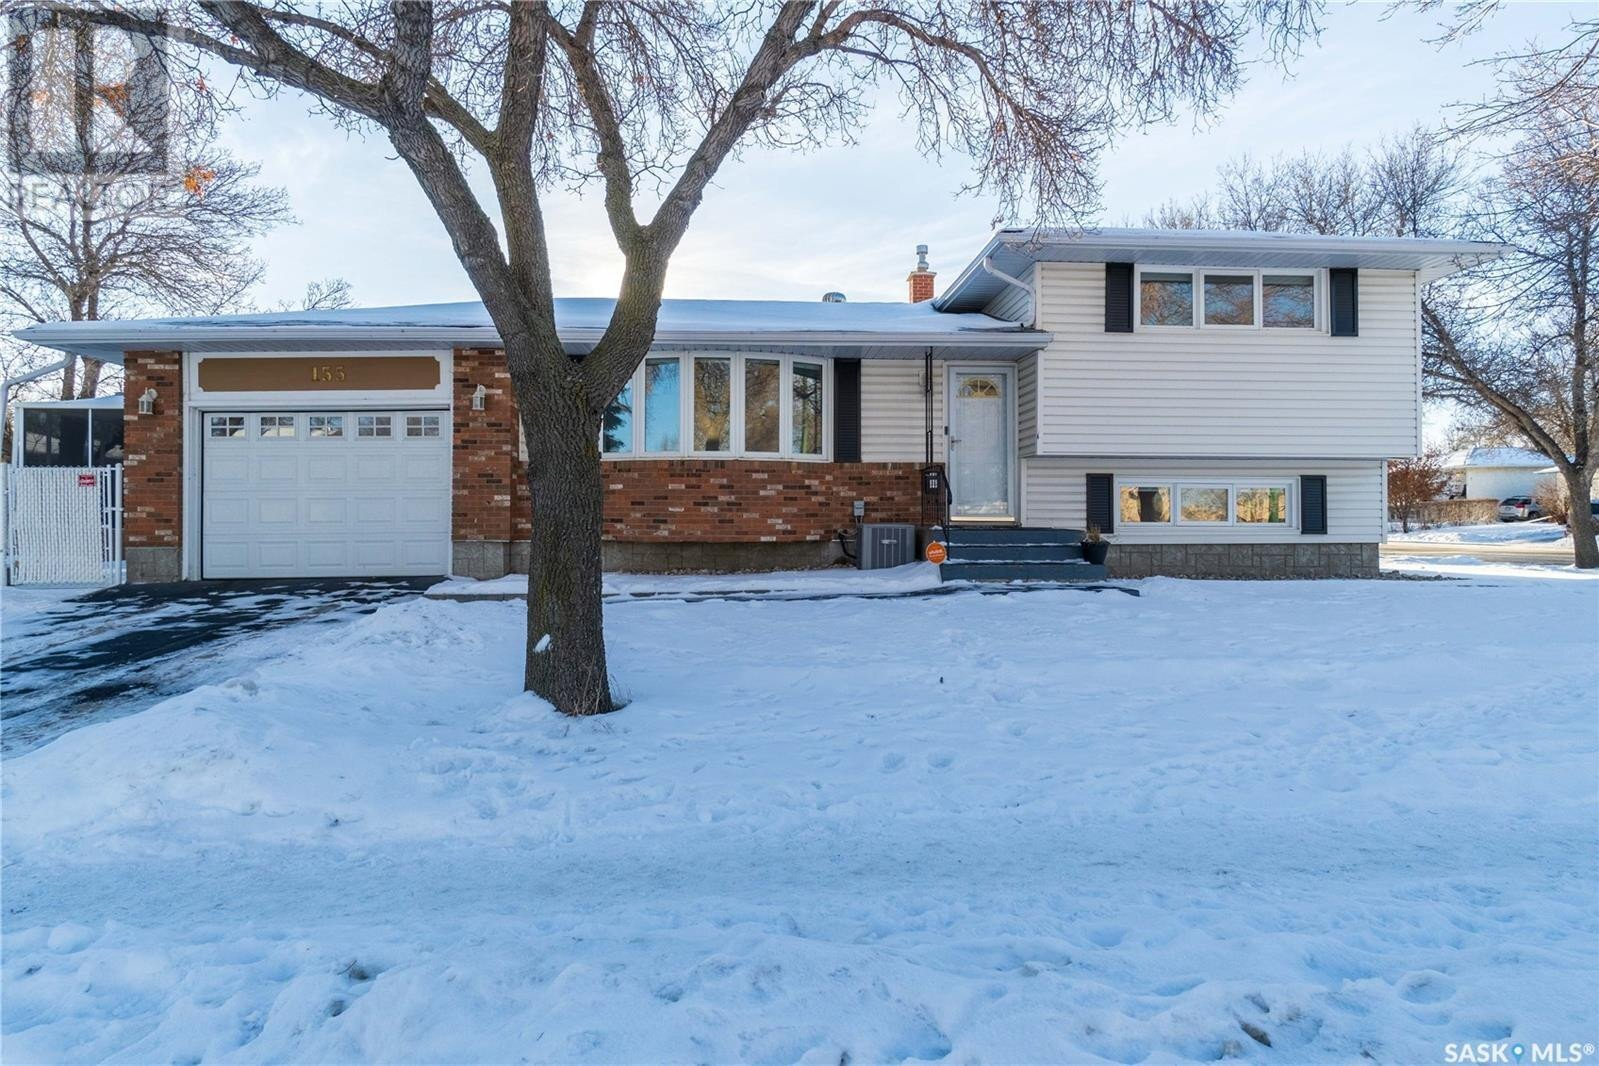 House for sale at 155 Fairview Rd Regina Saskatchewan - MLS: SK834876